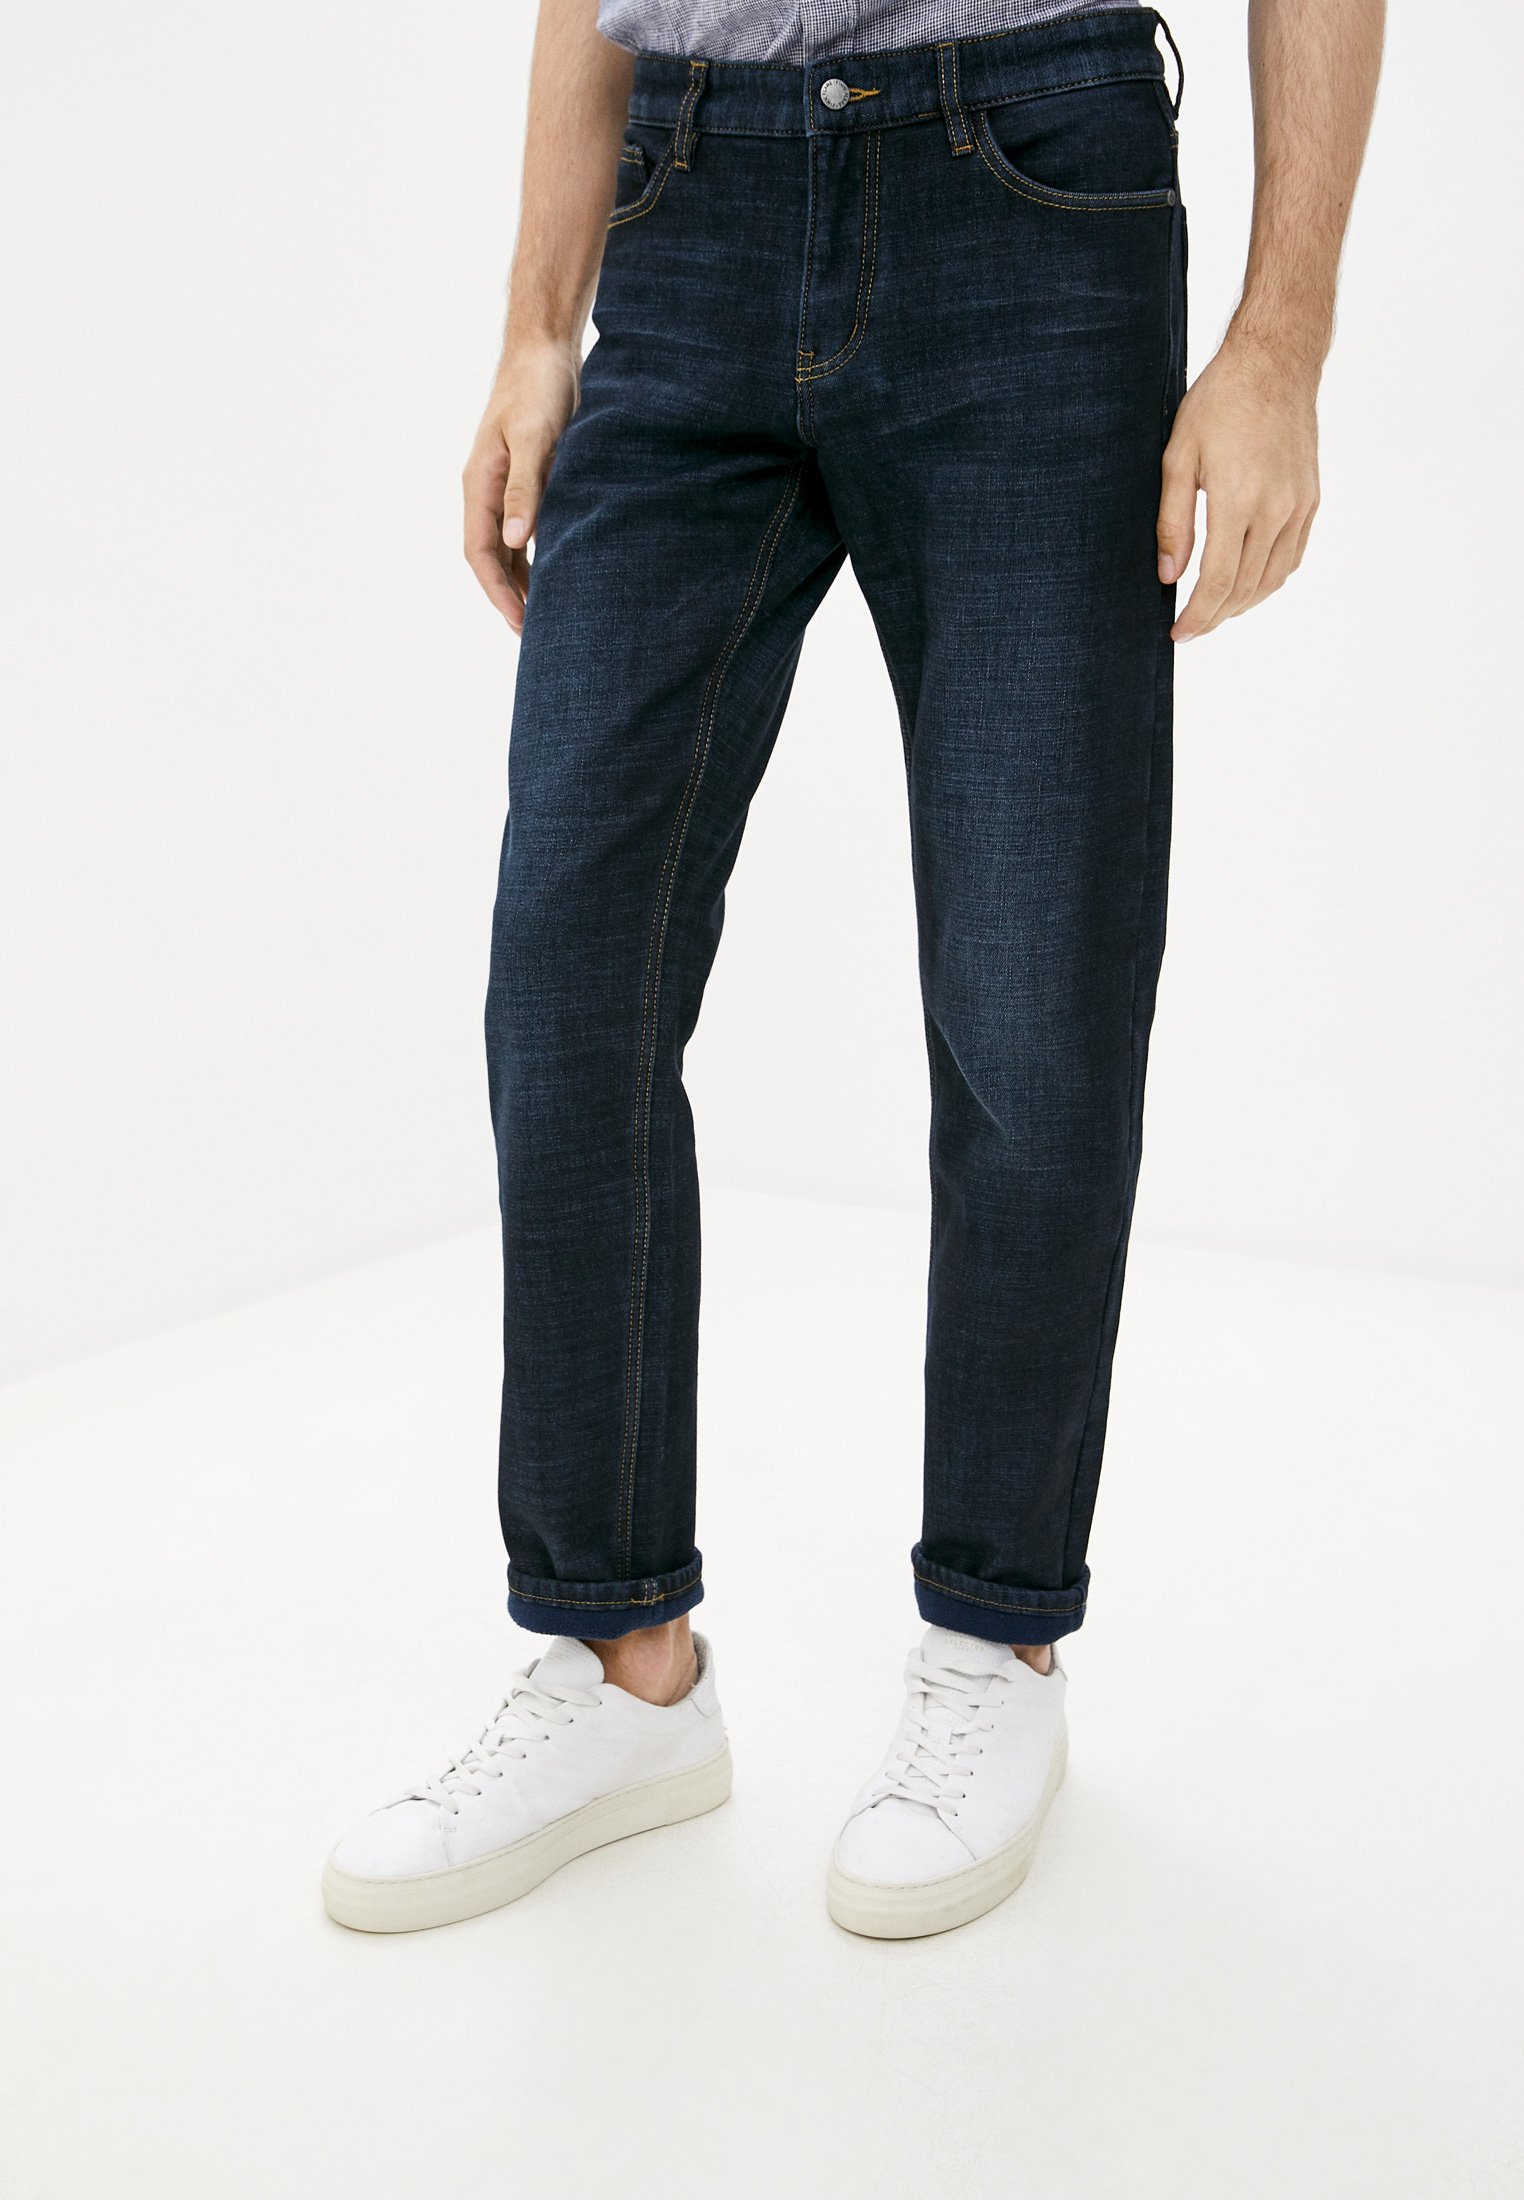 Мужские прямые джинсы Finn Flare (Фин Флаер) W19-25000